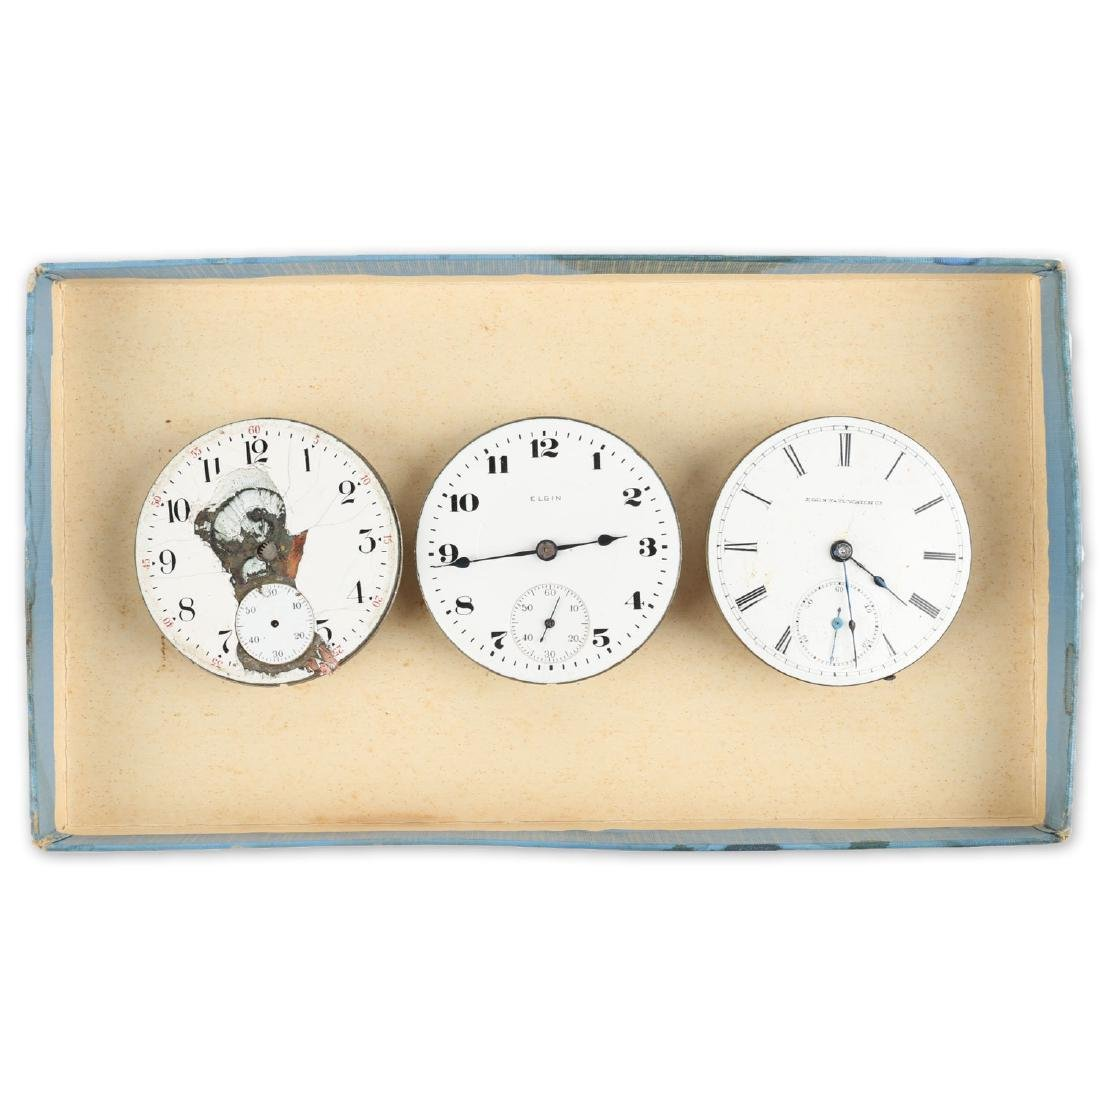 Three (3) 18S Elgin Pocket Watch Movement Assemblies